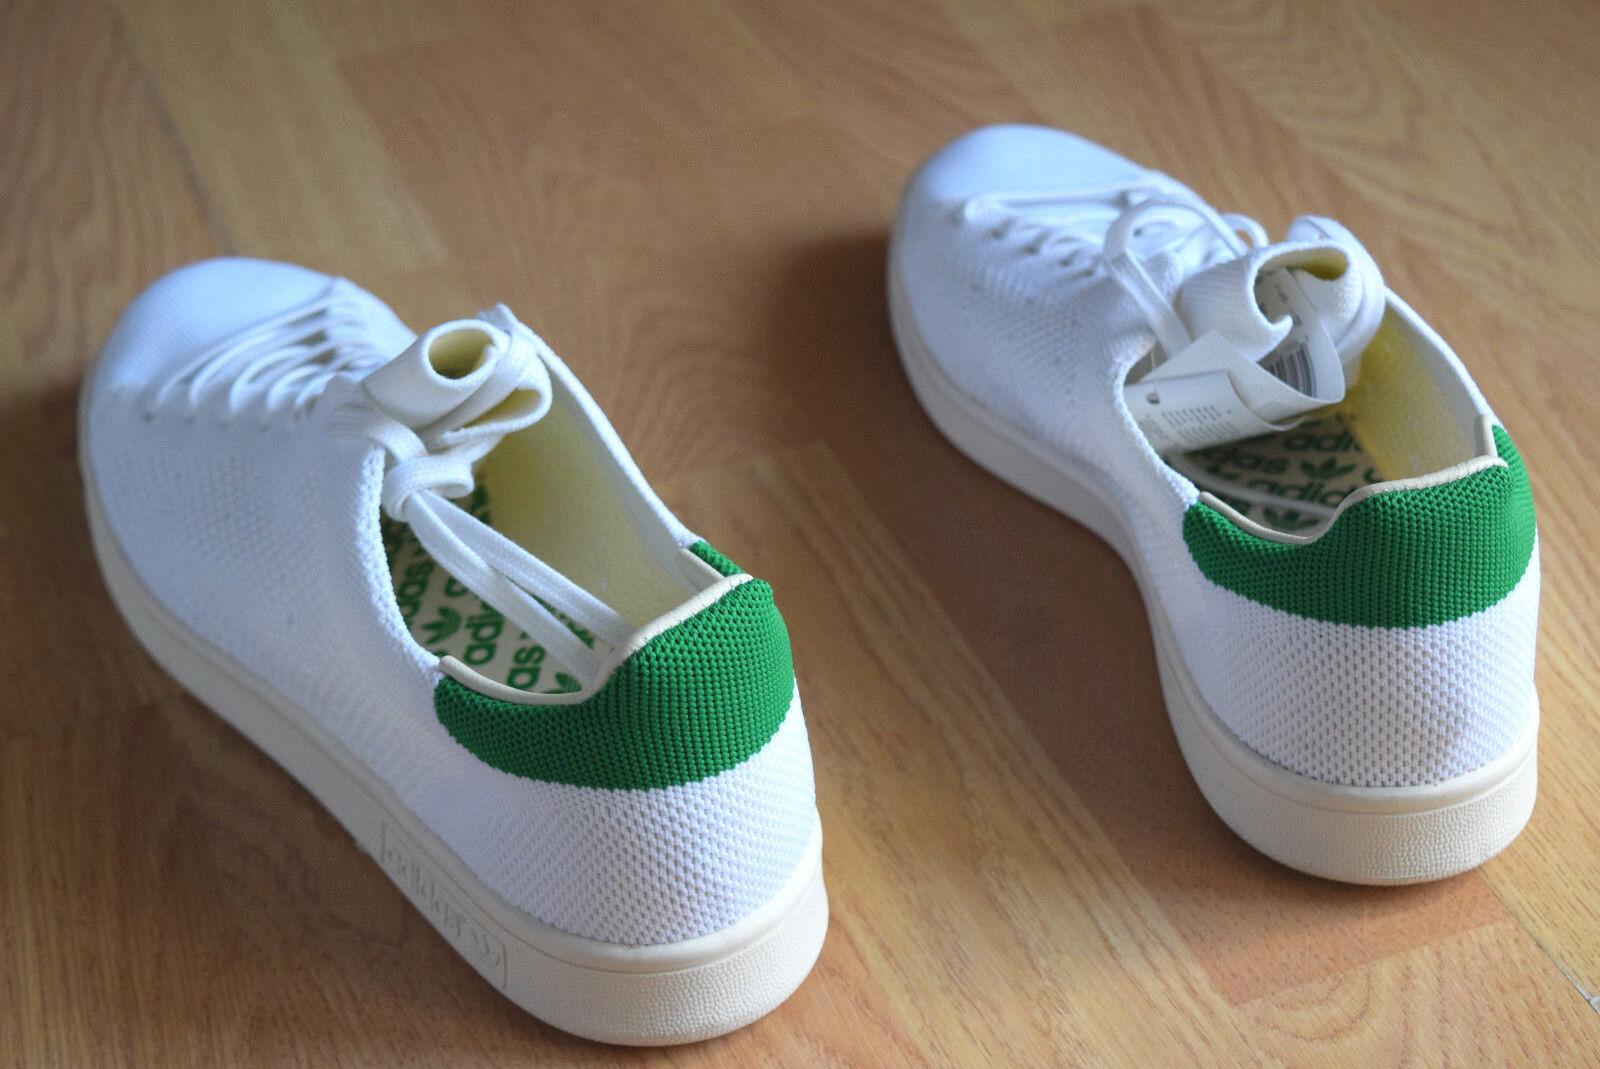 Adidas Stan Smith OG PK 40 41 42 48 43 44 45 46 48 42 suPeRsTaR gazelle campus S75146 45613b